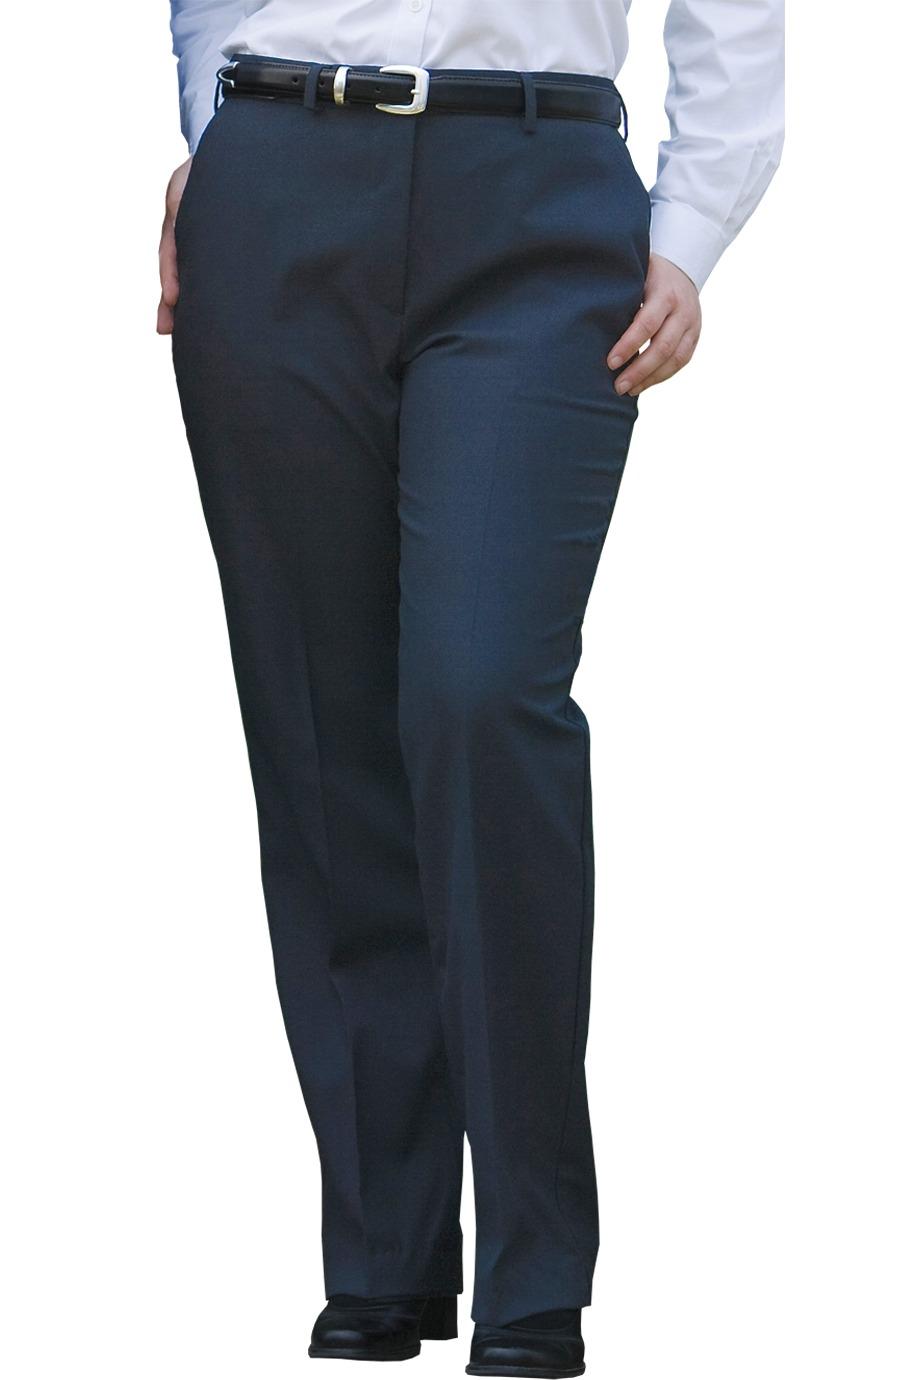 Edwards Garment 8783 - Women's Wool Blend Flat Front Dress Pant